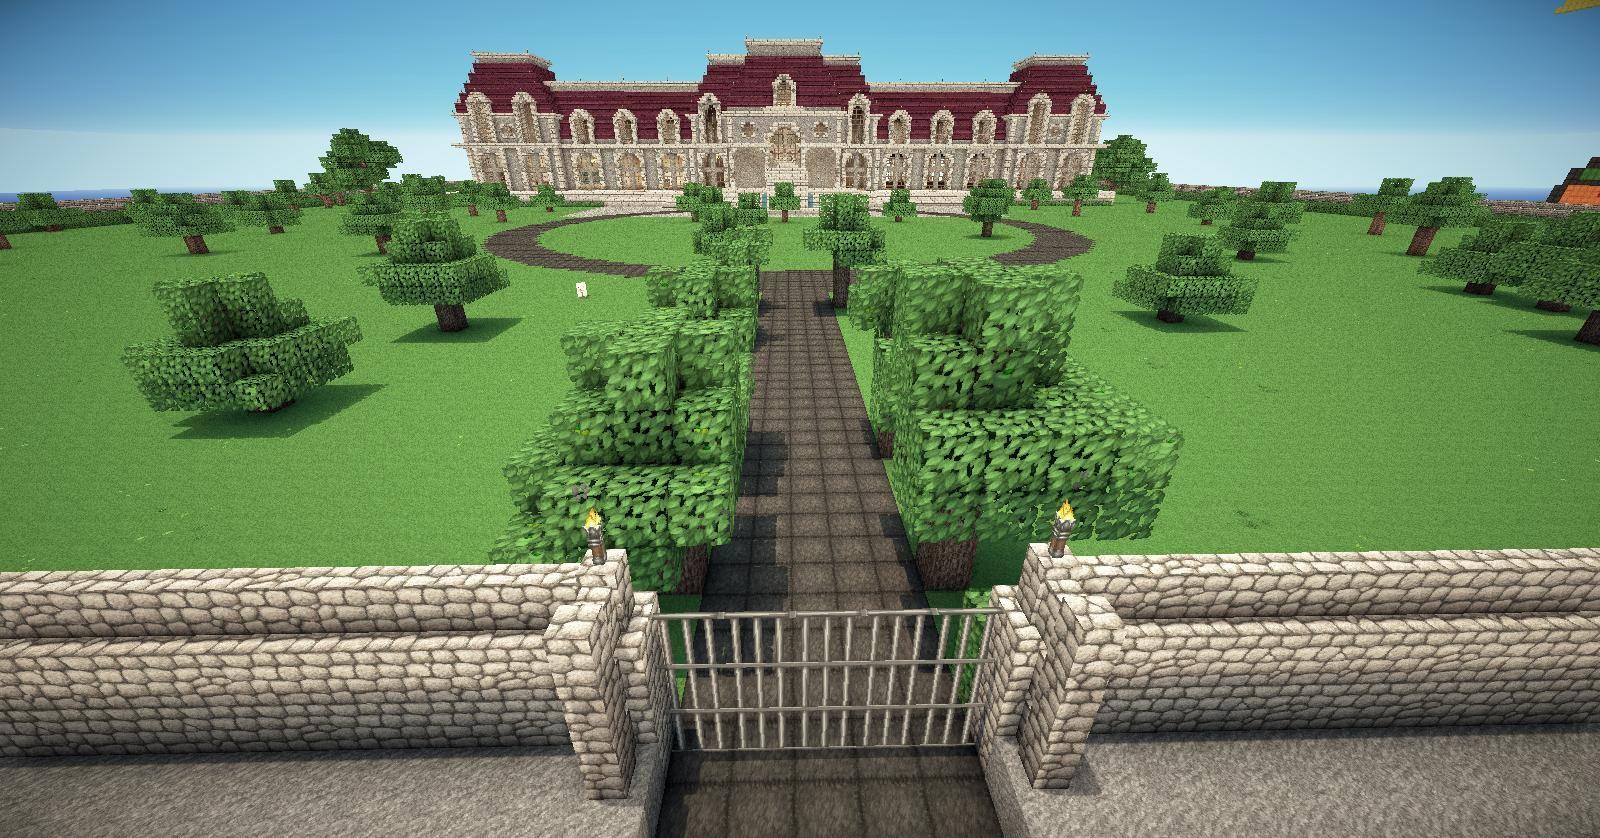 Minecraft Mansion Exterior And Interior